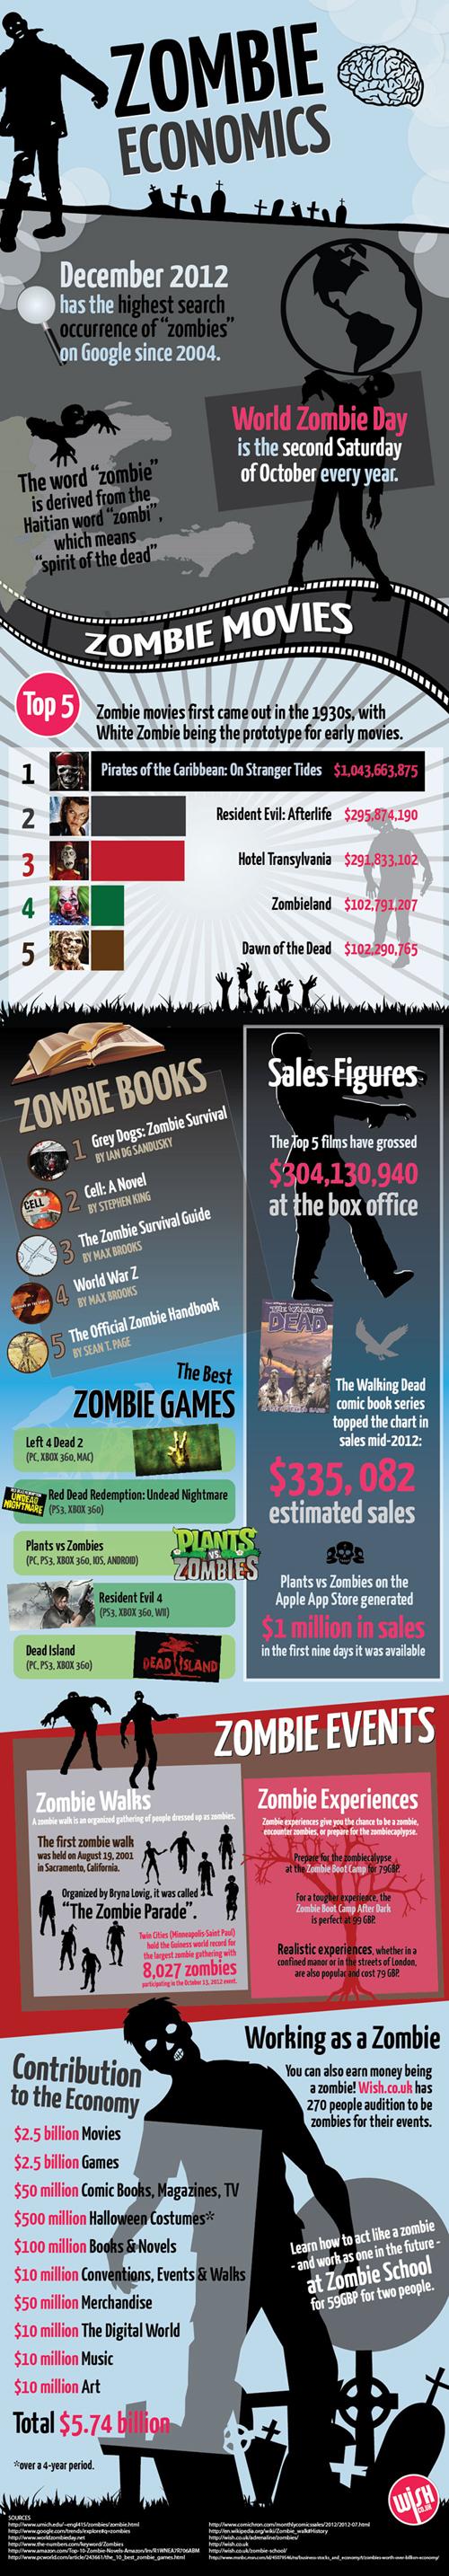 zombie_economics_final-5001